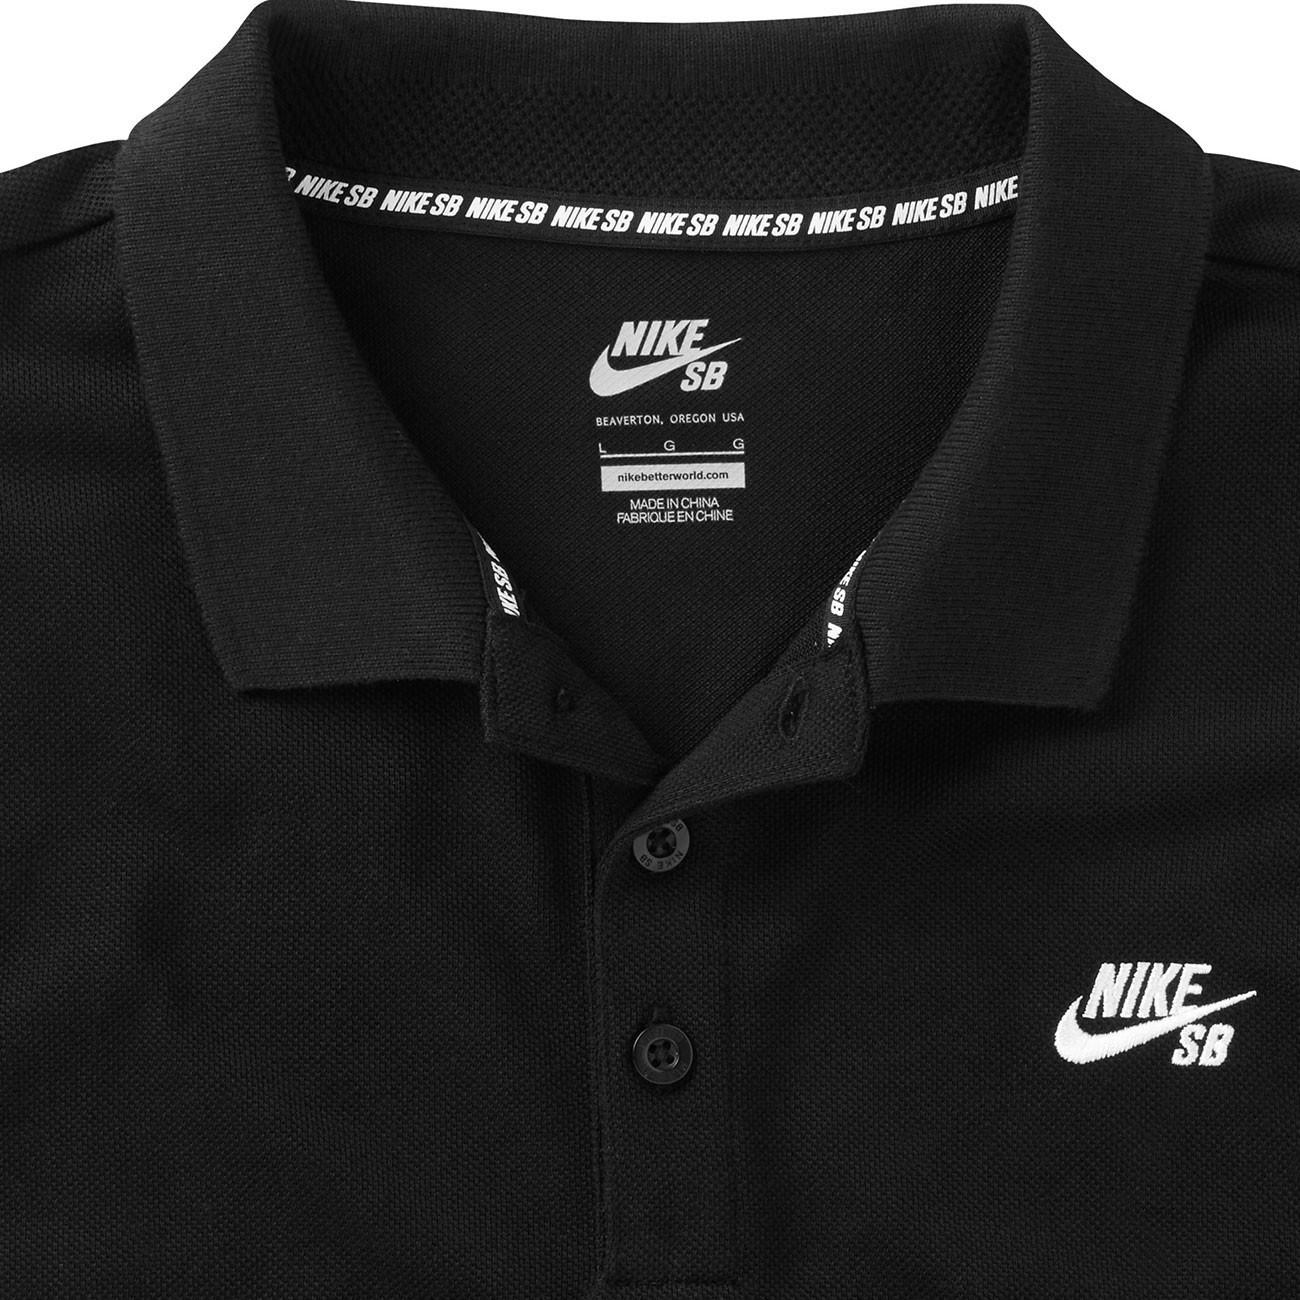 T-shirt Nike SB Pique Polo black white  875309922a20